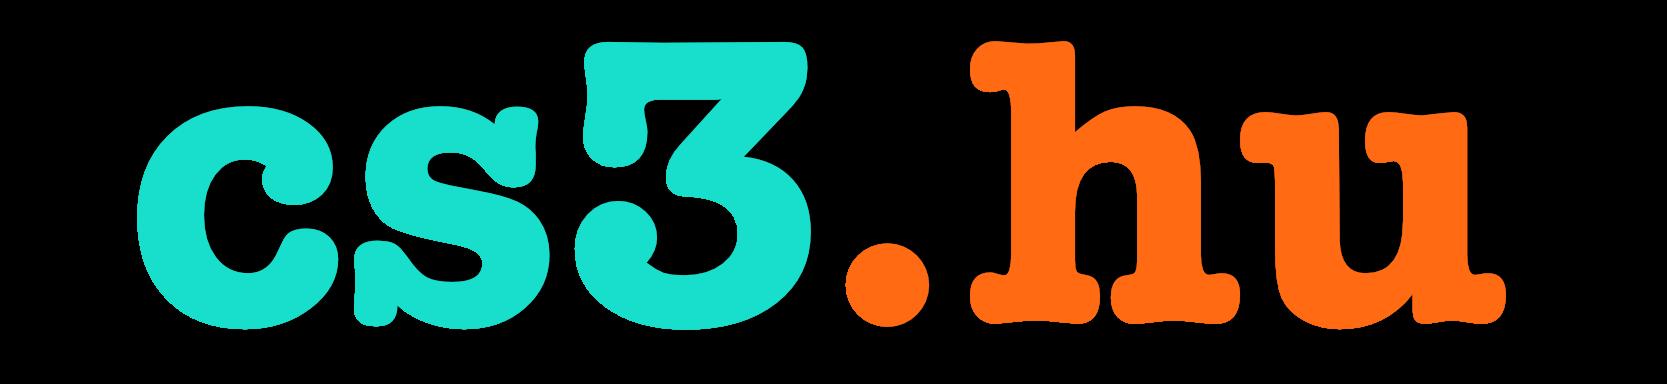 Cs3.hu